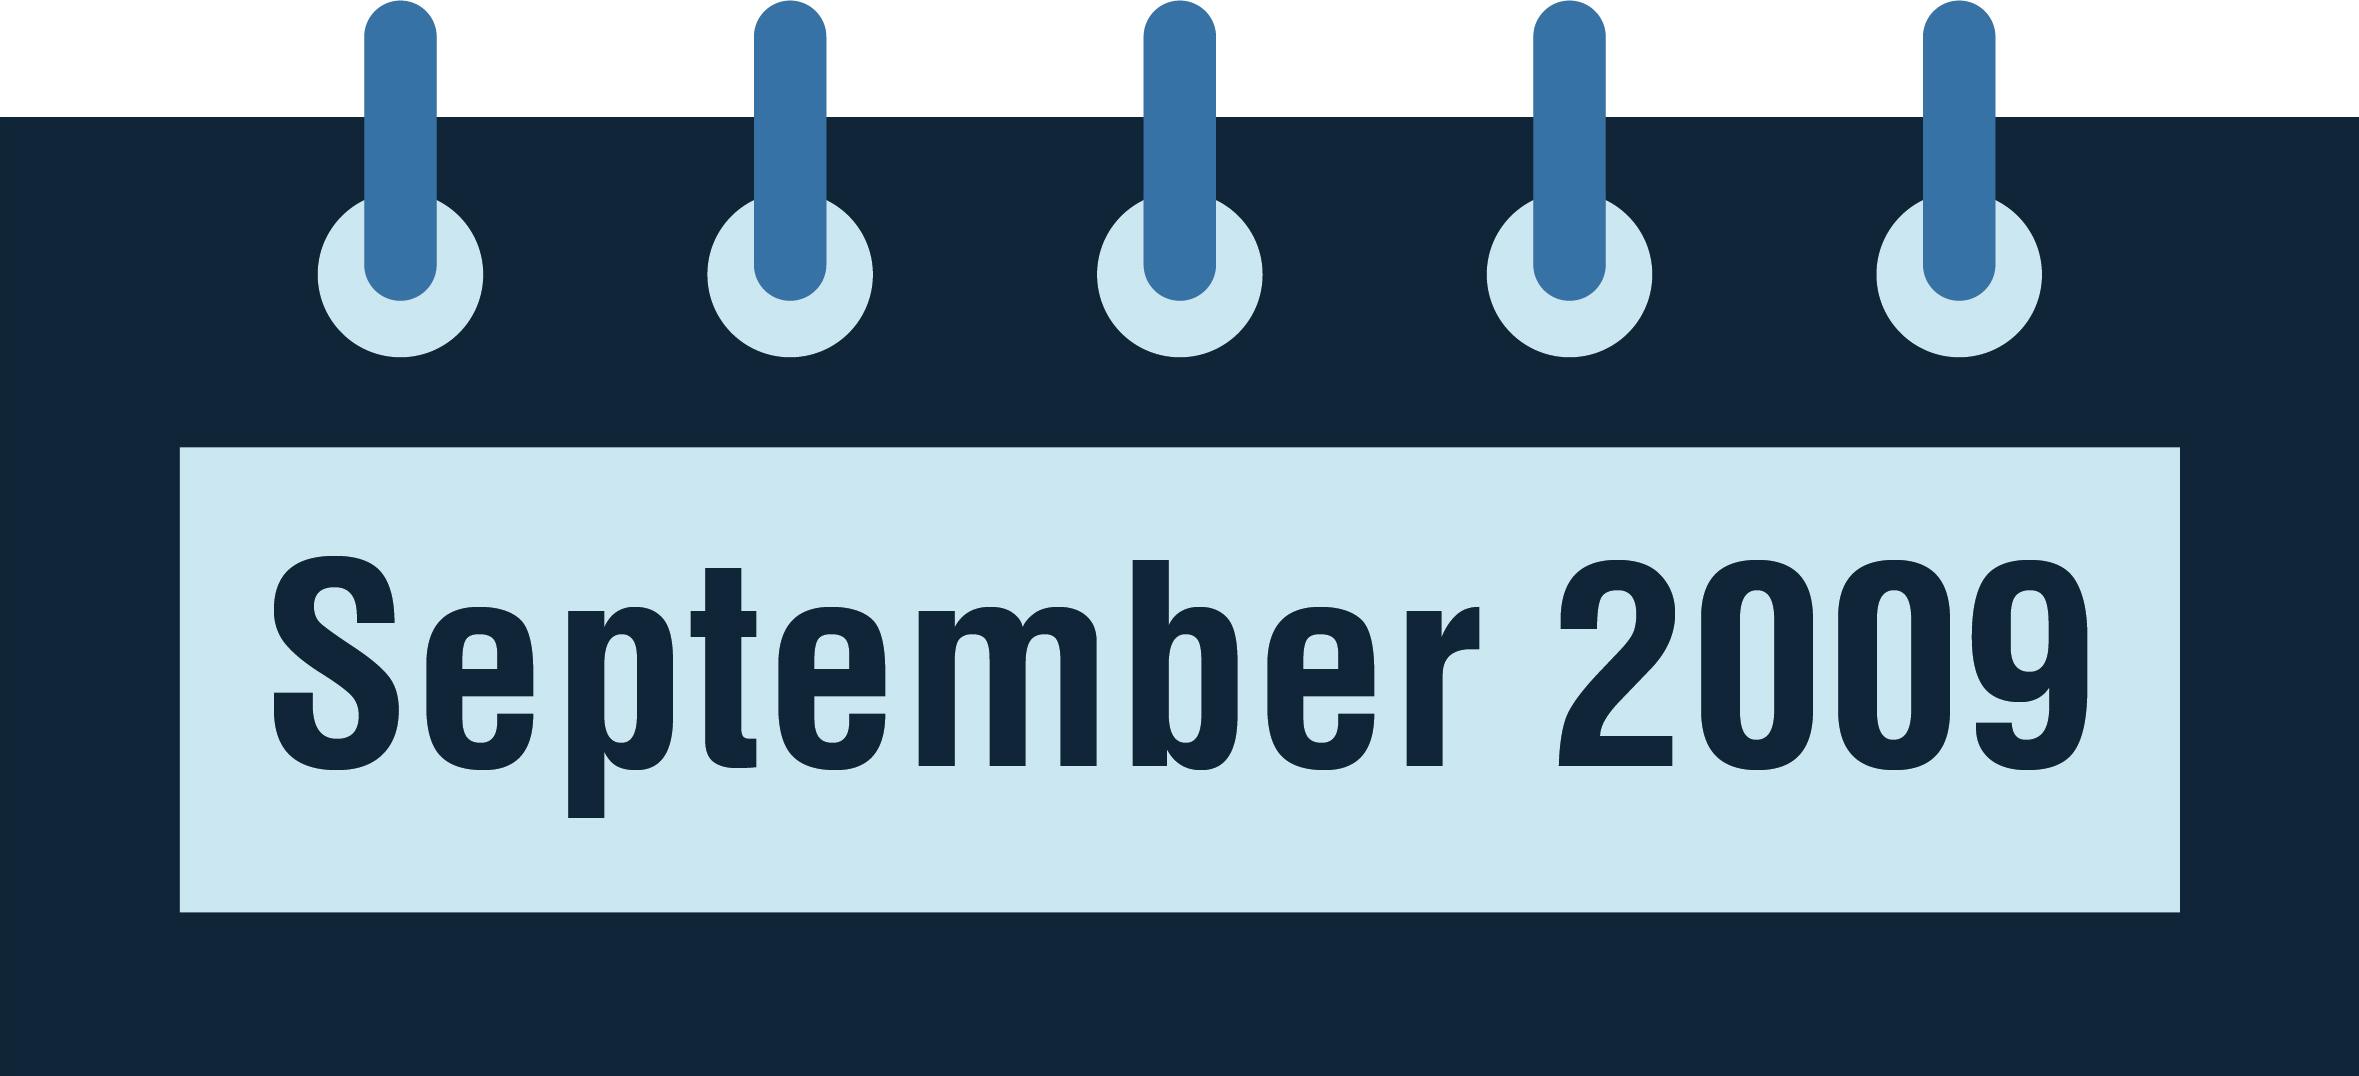 NeuroCheck History - September 2009 (Image © NeuroCheck)